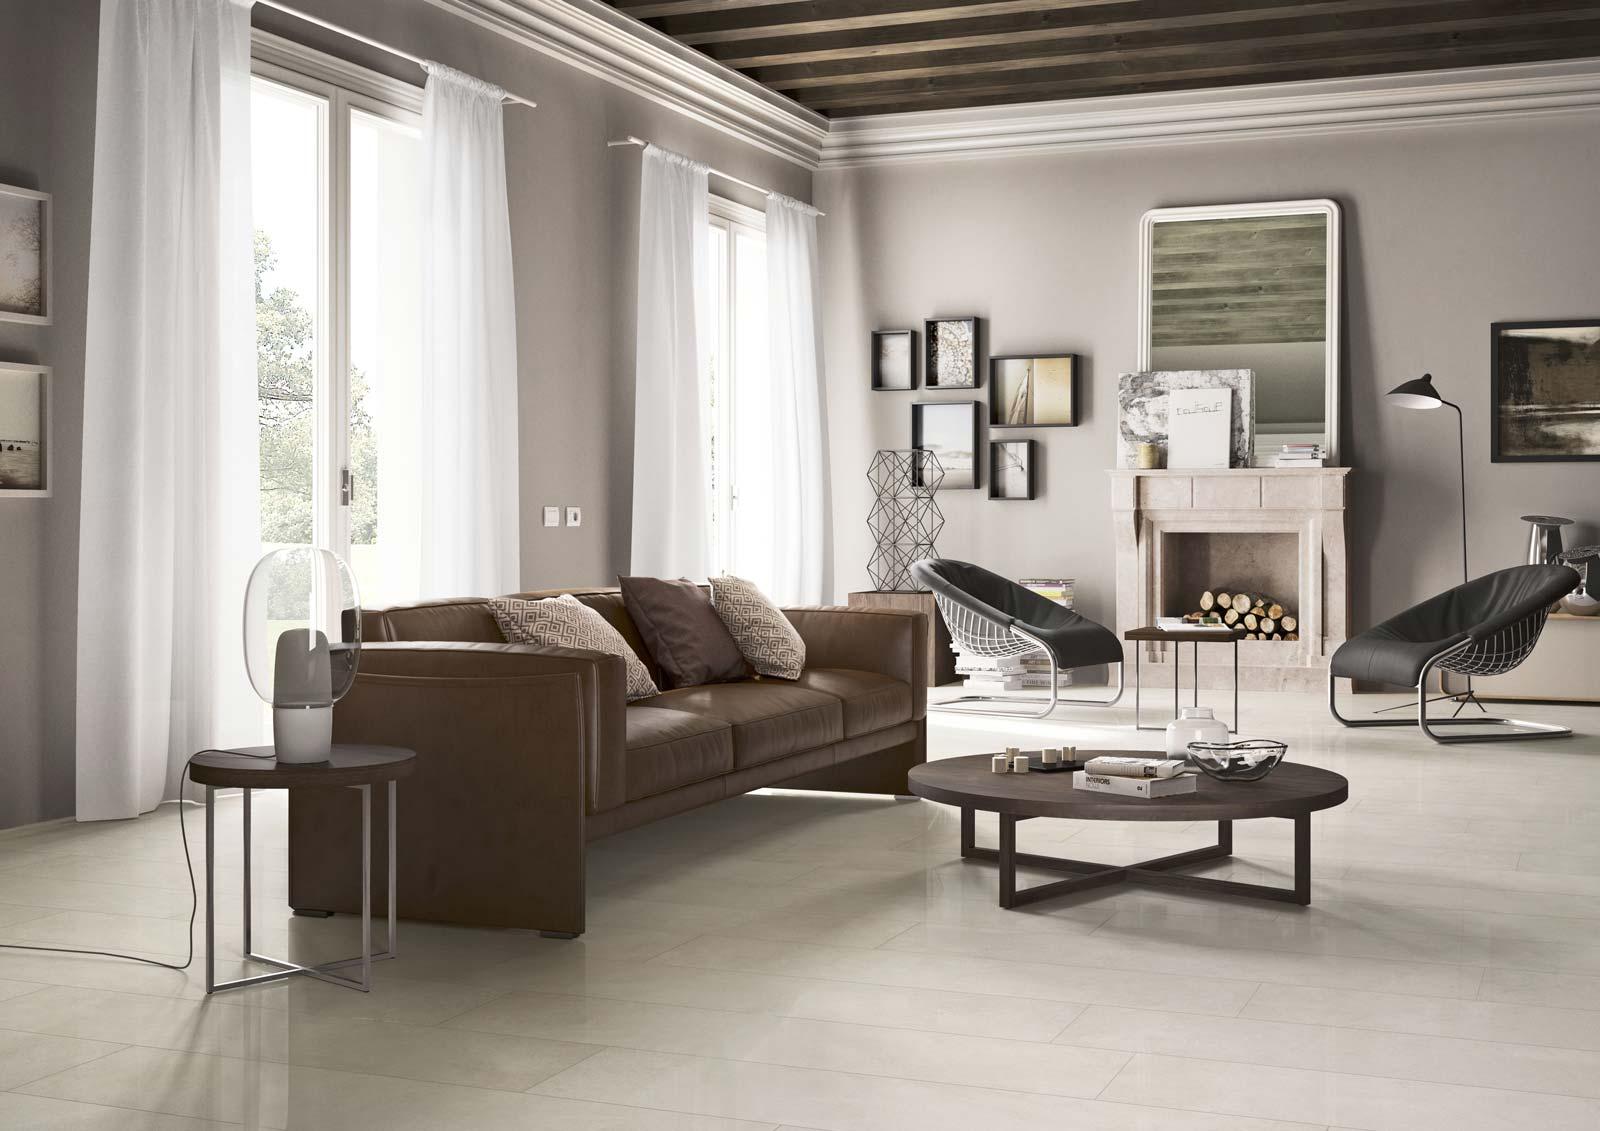 Carrelage salon inspiration d co marazzi for Inspiration salon